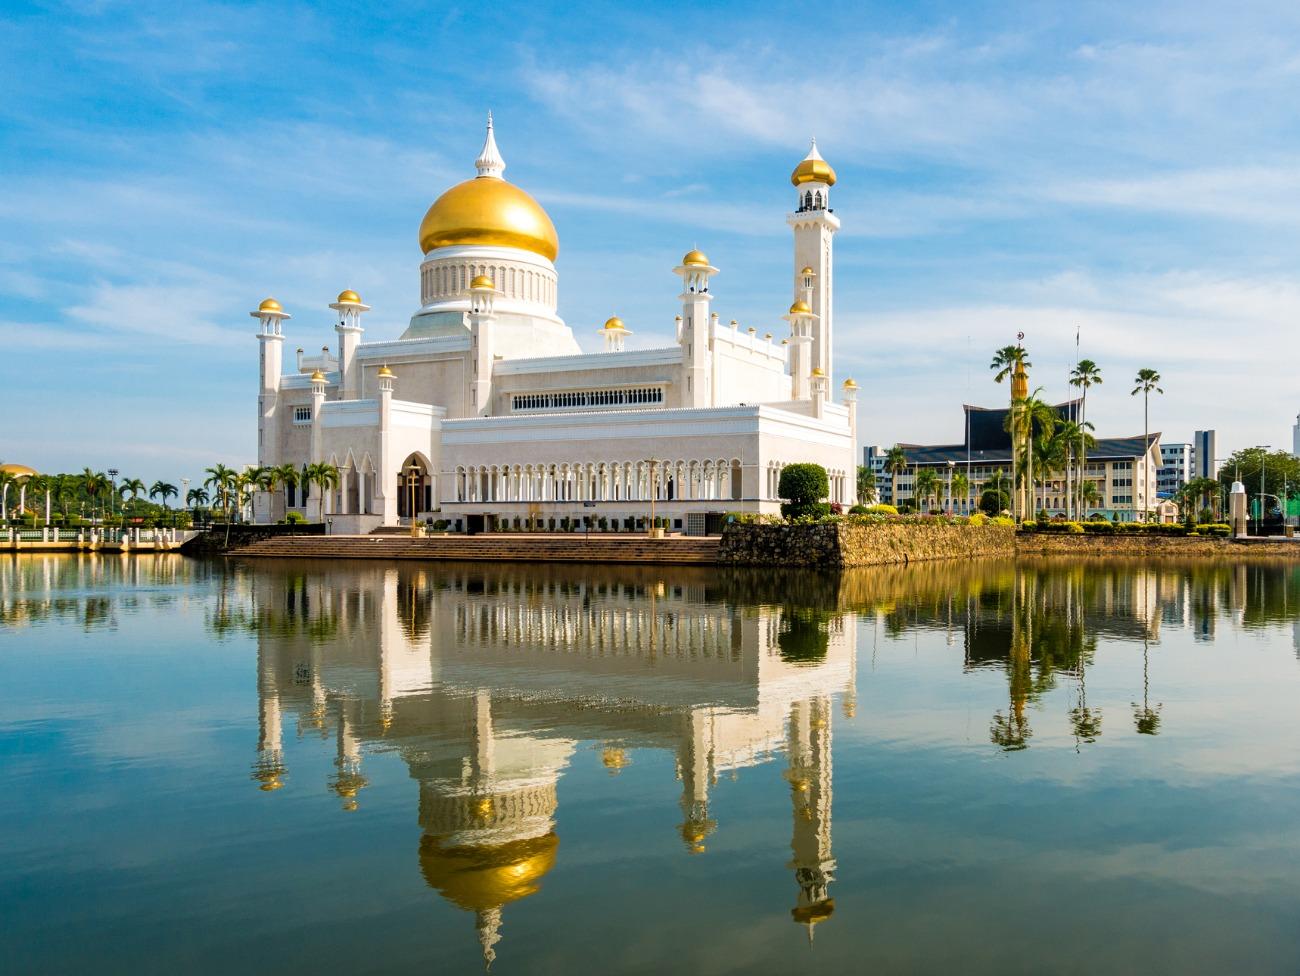 Brunei creates anti-gay laws, enforces death penalty, then